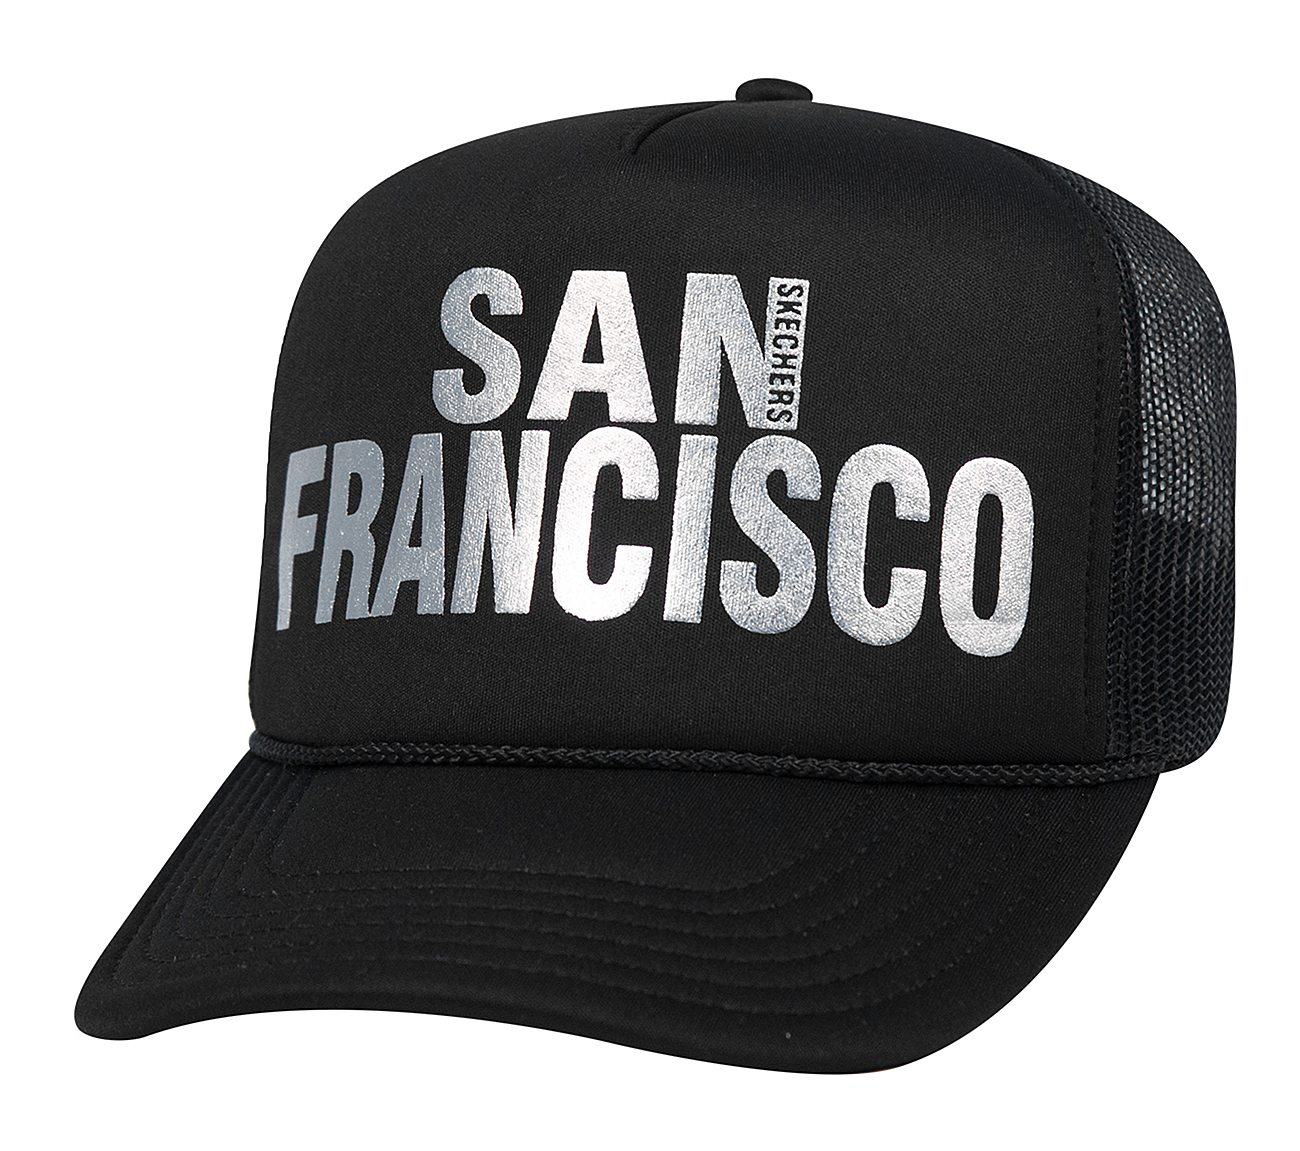 City Hat - San Francisco